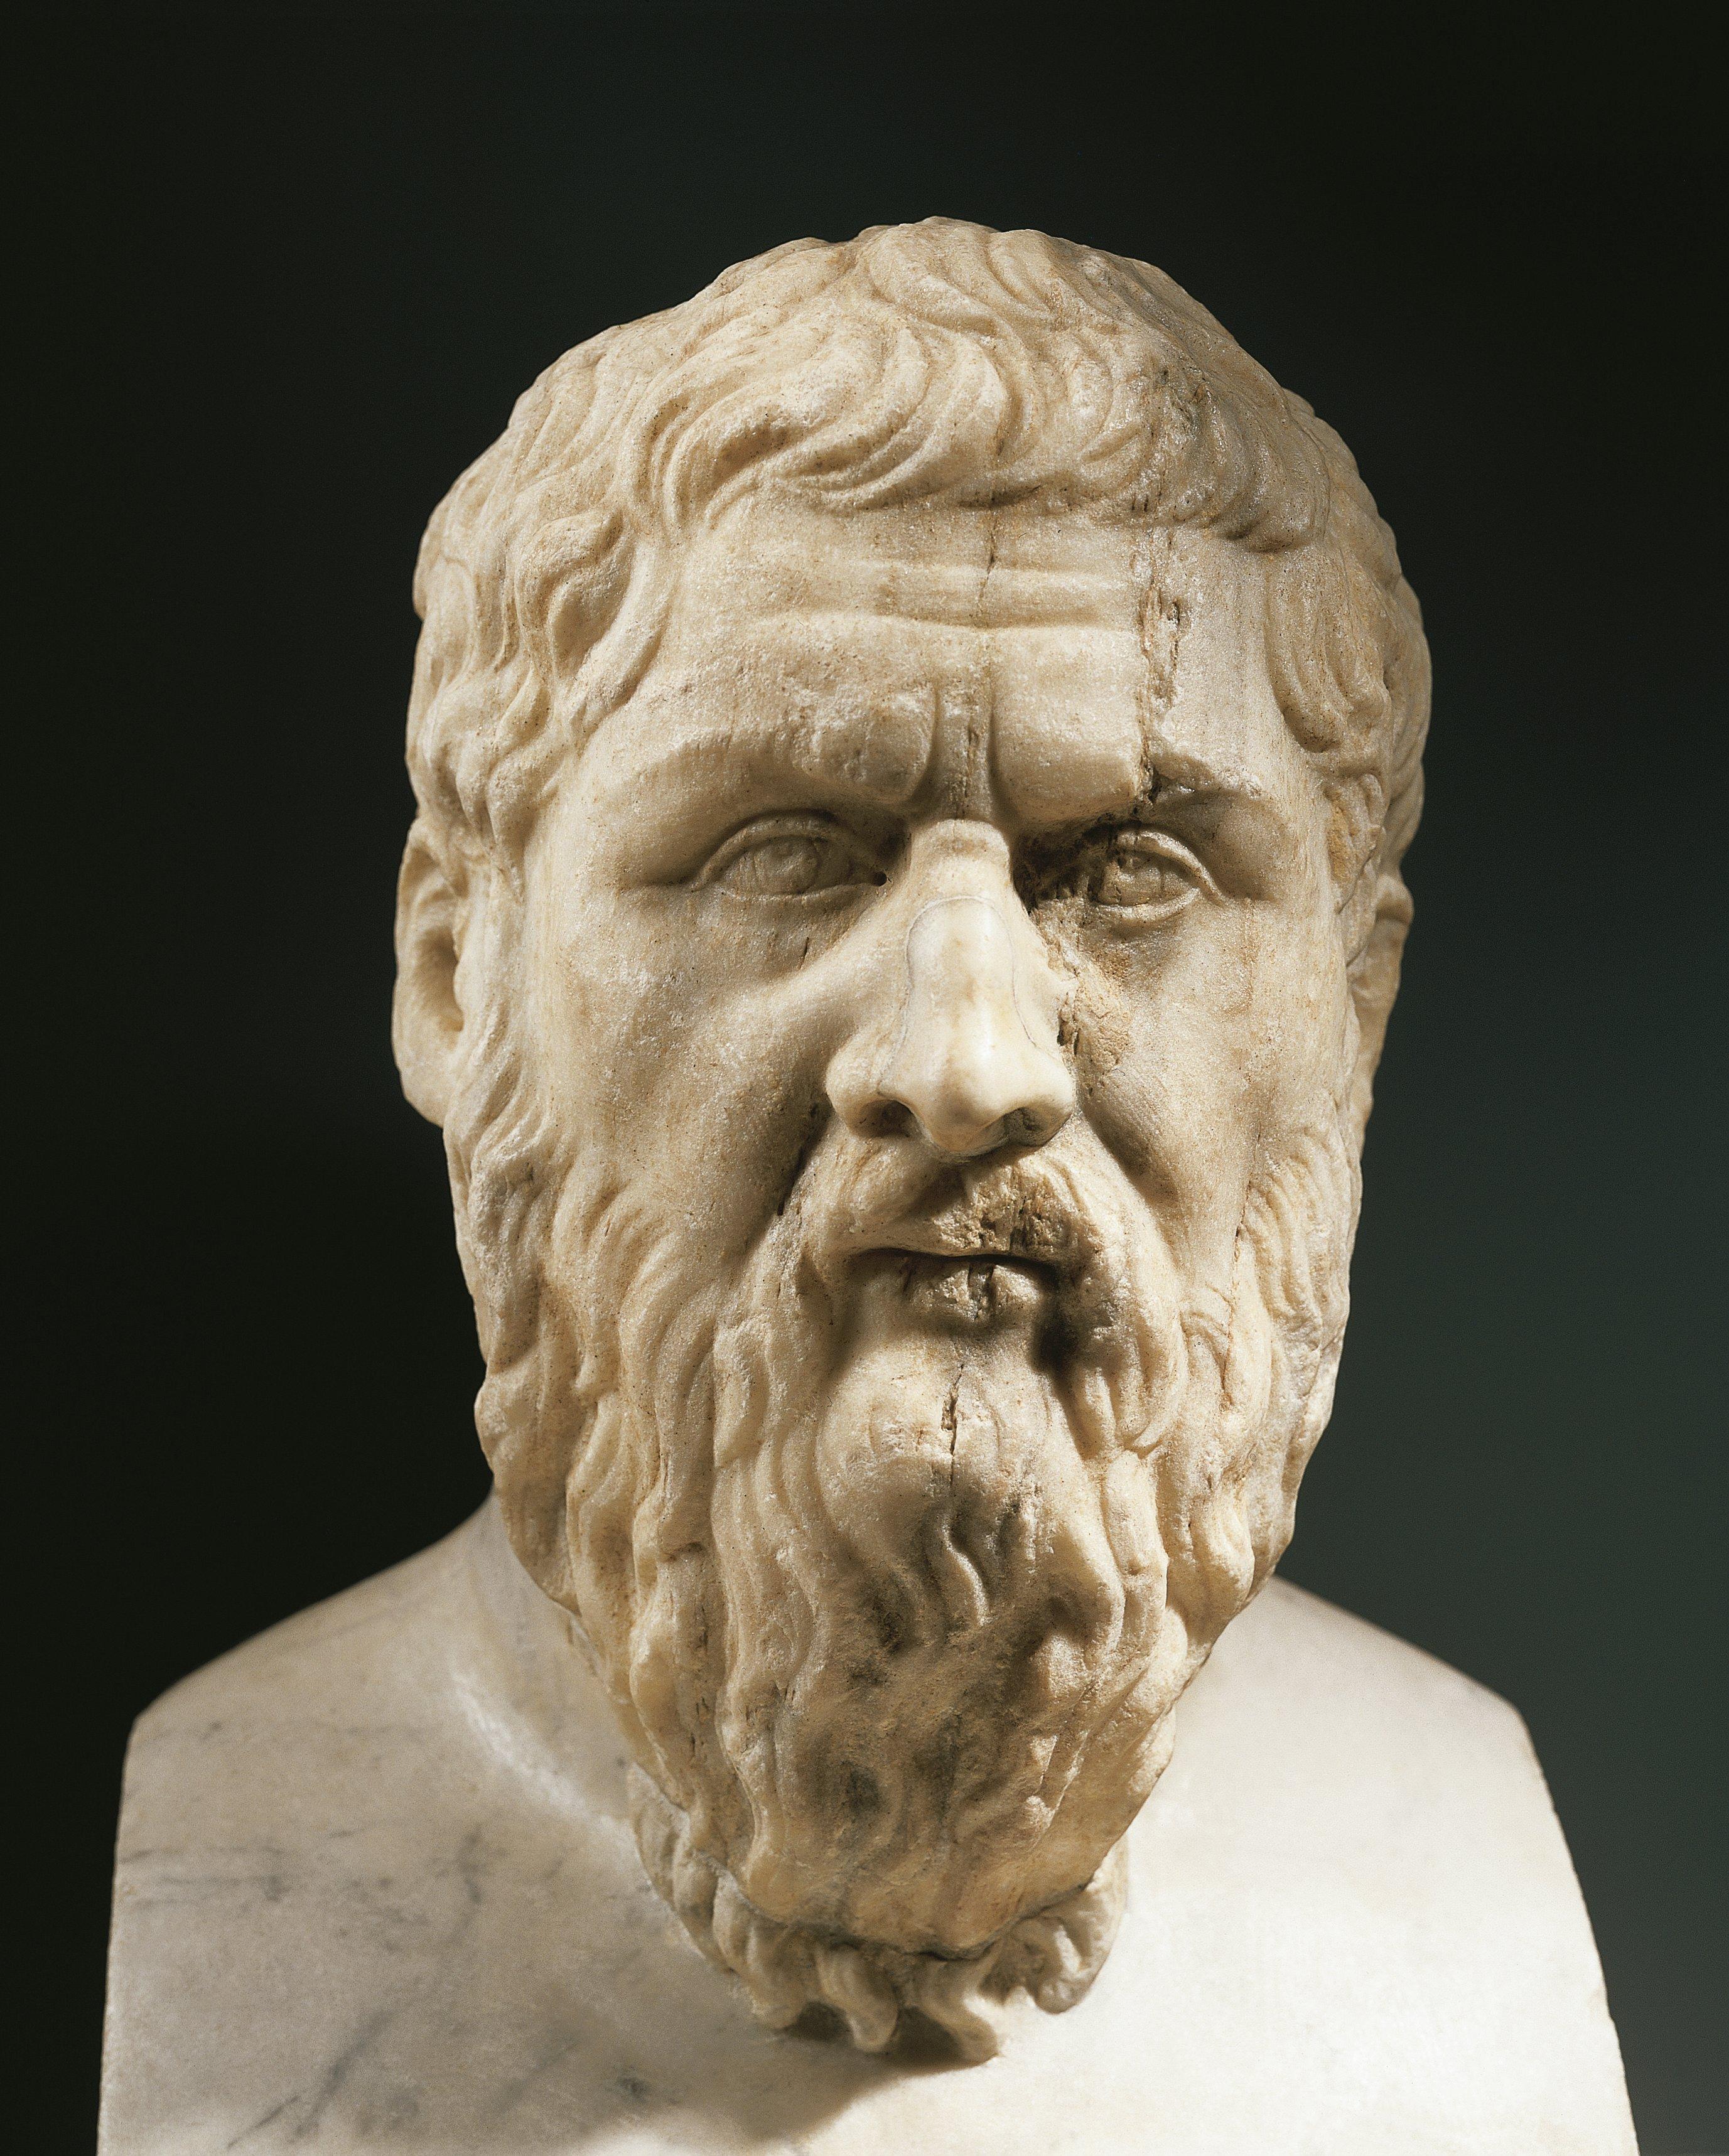 Head of Plato (circa 428- 248 B.C.), Greek philosopher, marble